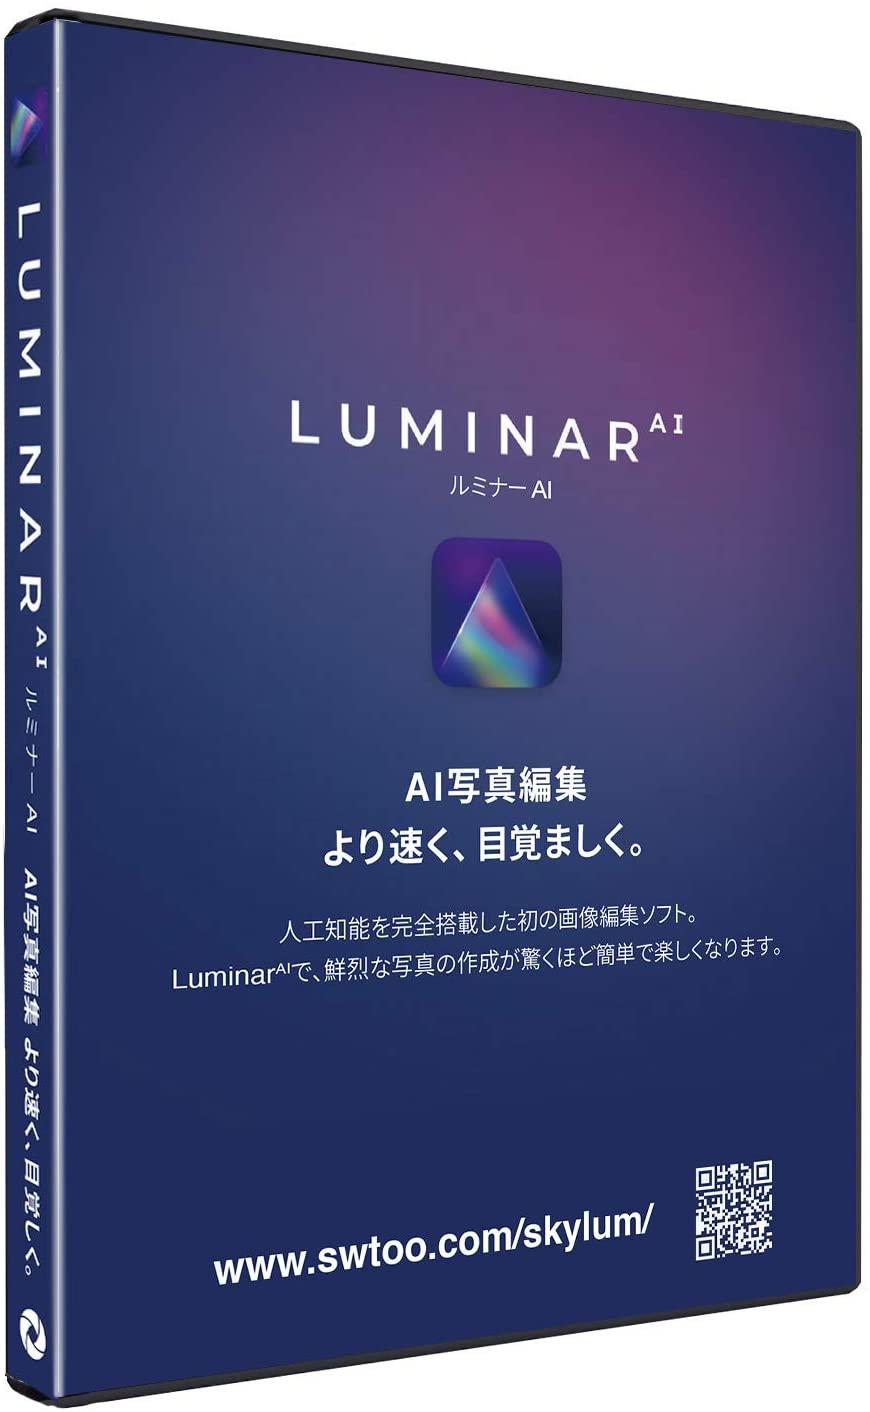 Luminar AI 日本語パッケージ版 Mac&Win(送料無料)